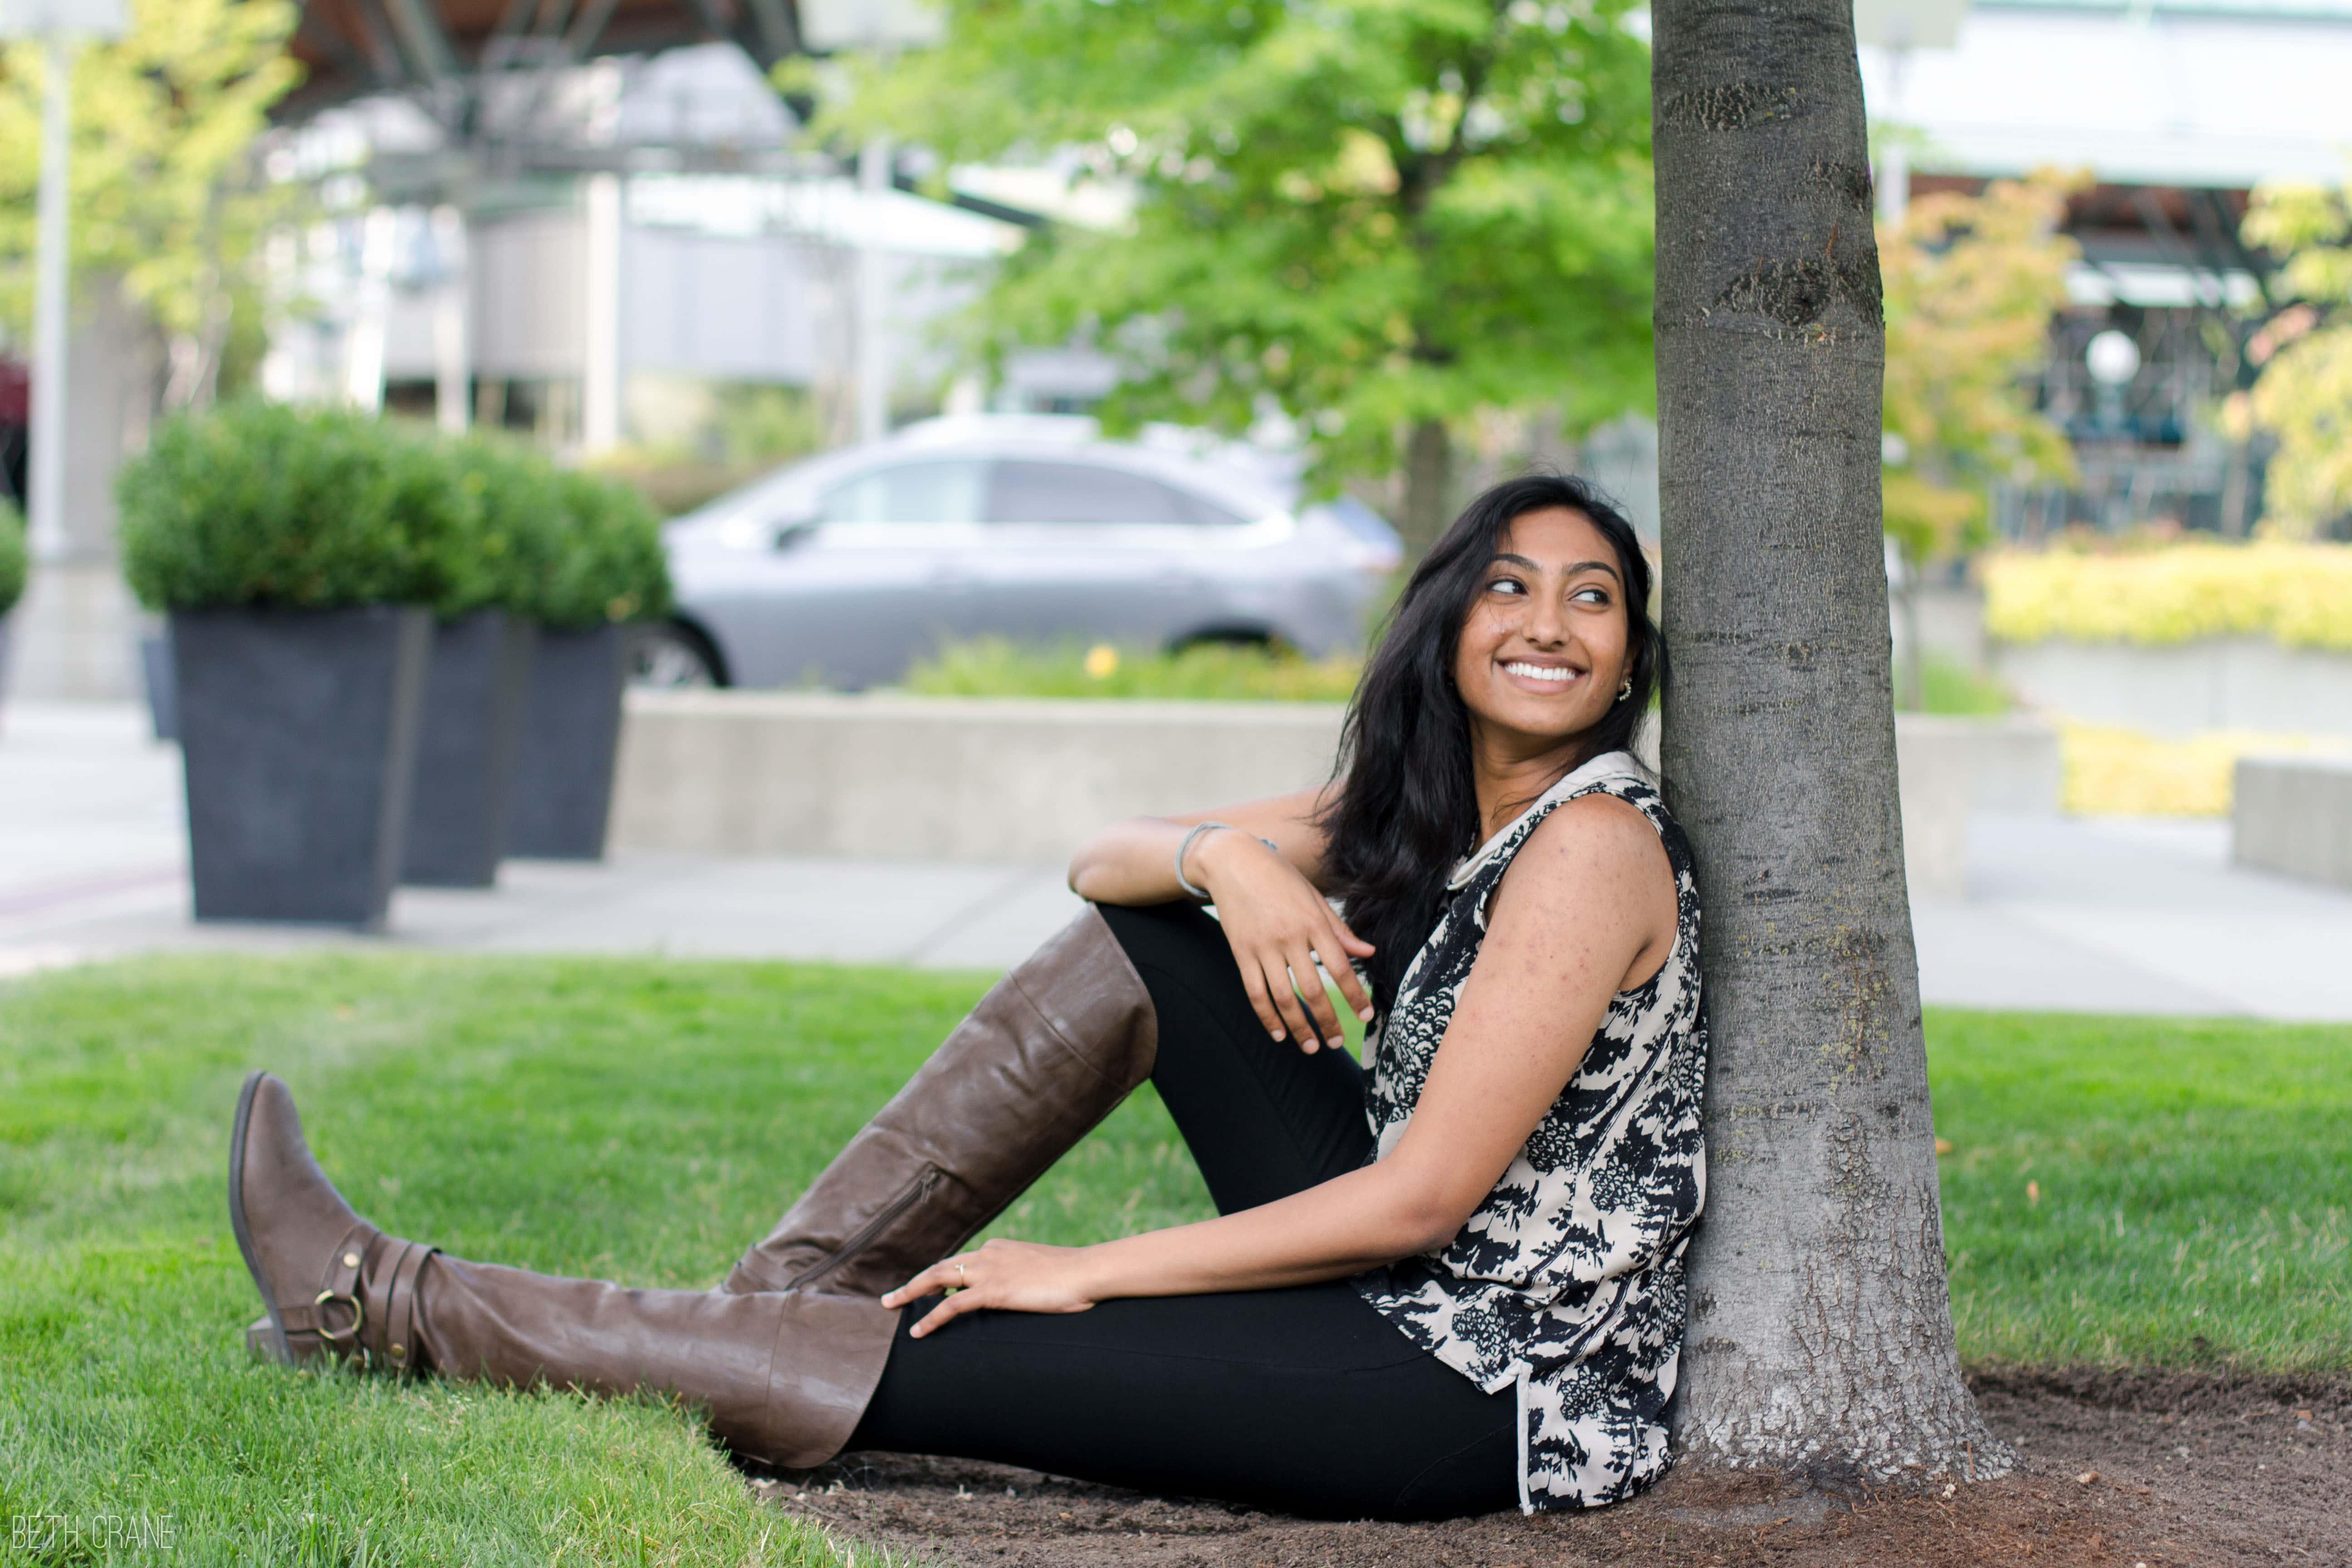 Sneha Jayaprakash is kickstarting her career